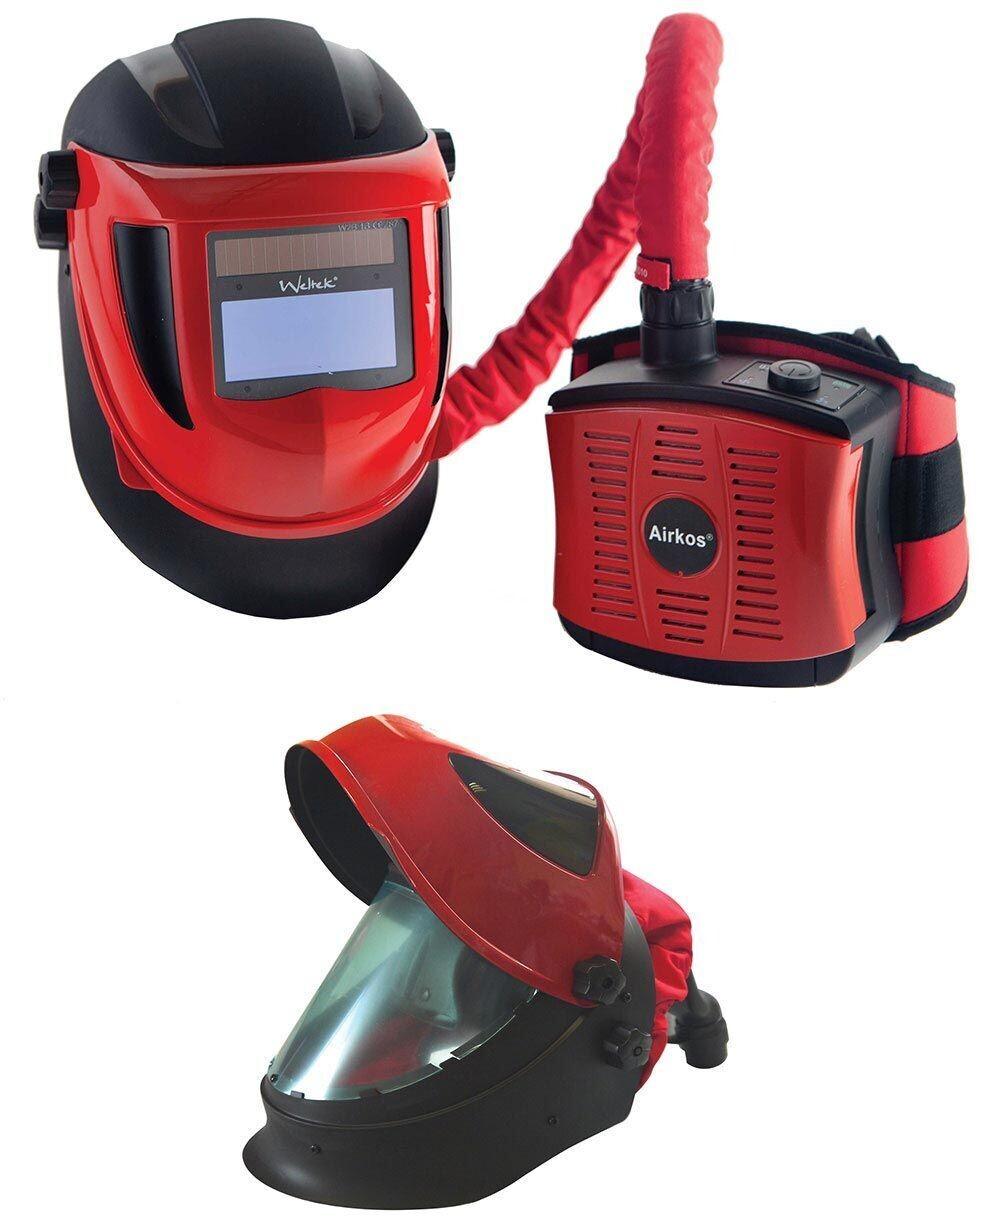 Weltek Navitek S4 Air Fed Auto Welding Helmet - RPE Fume Extractor